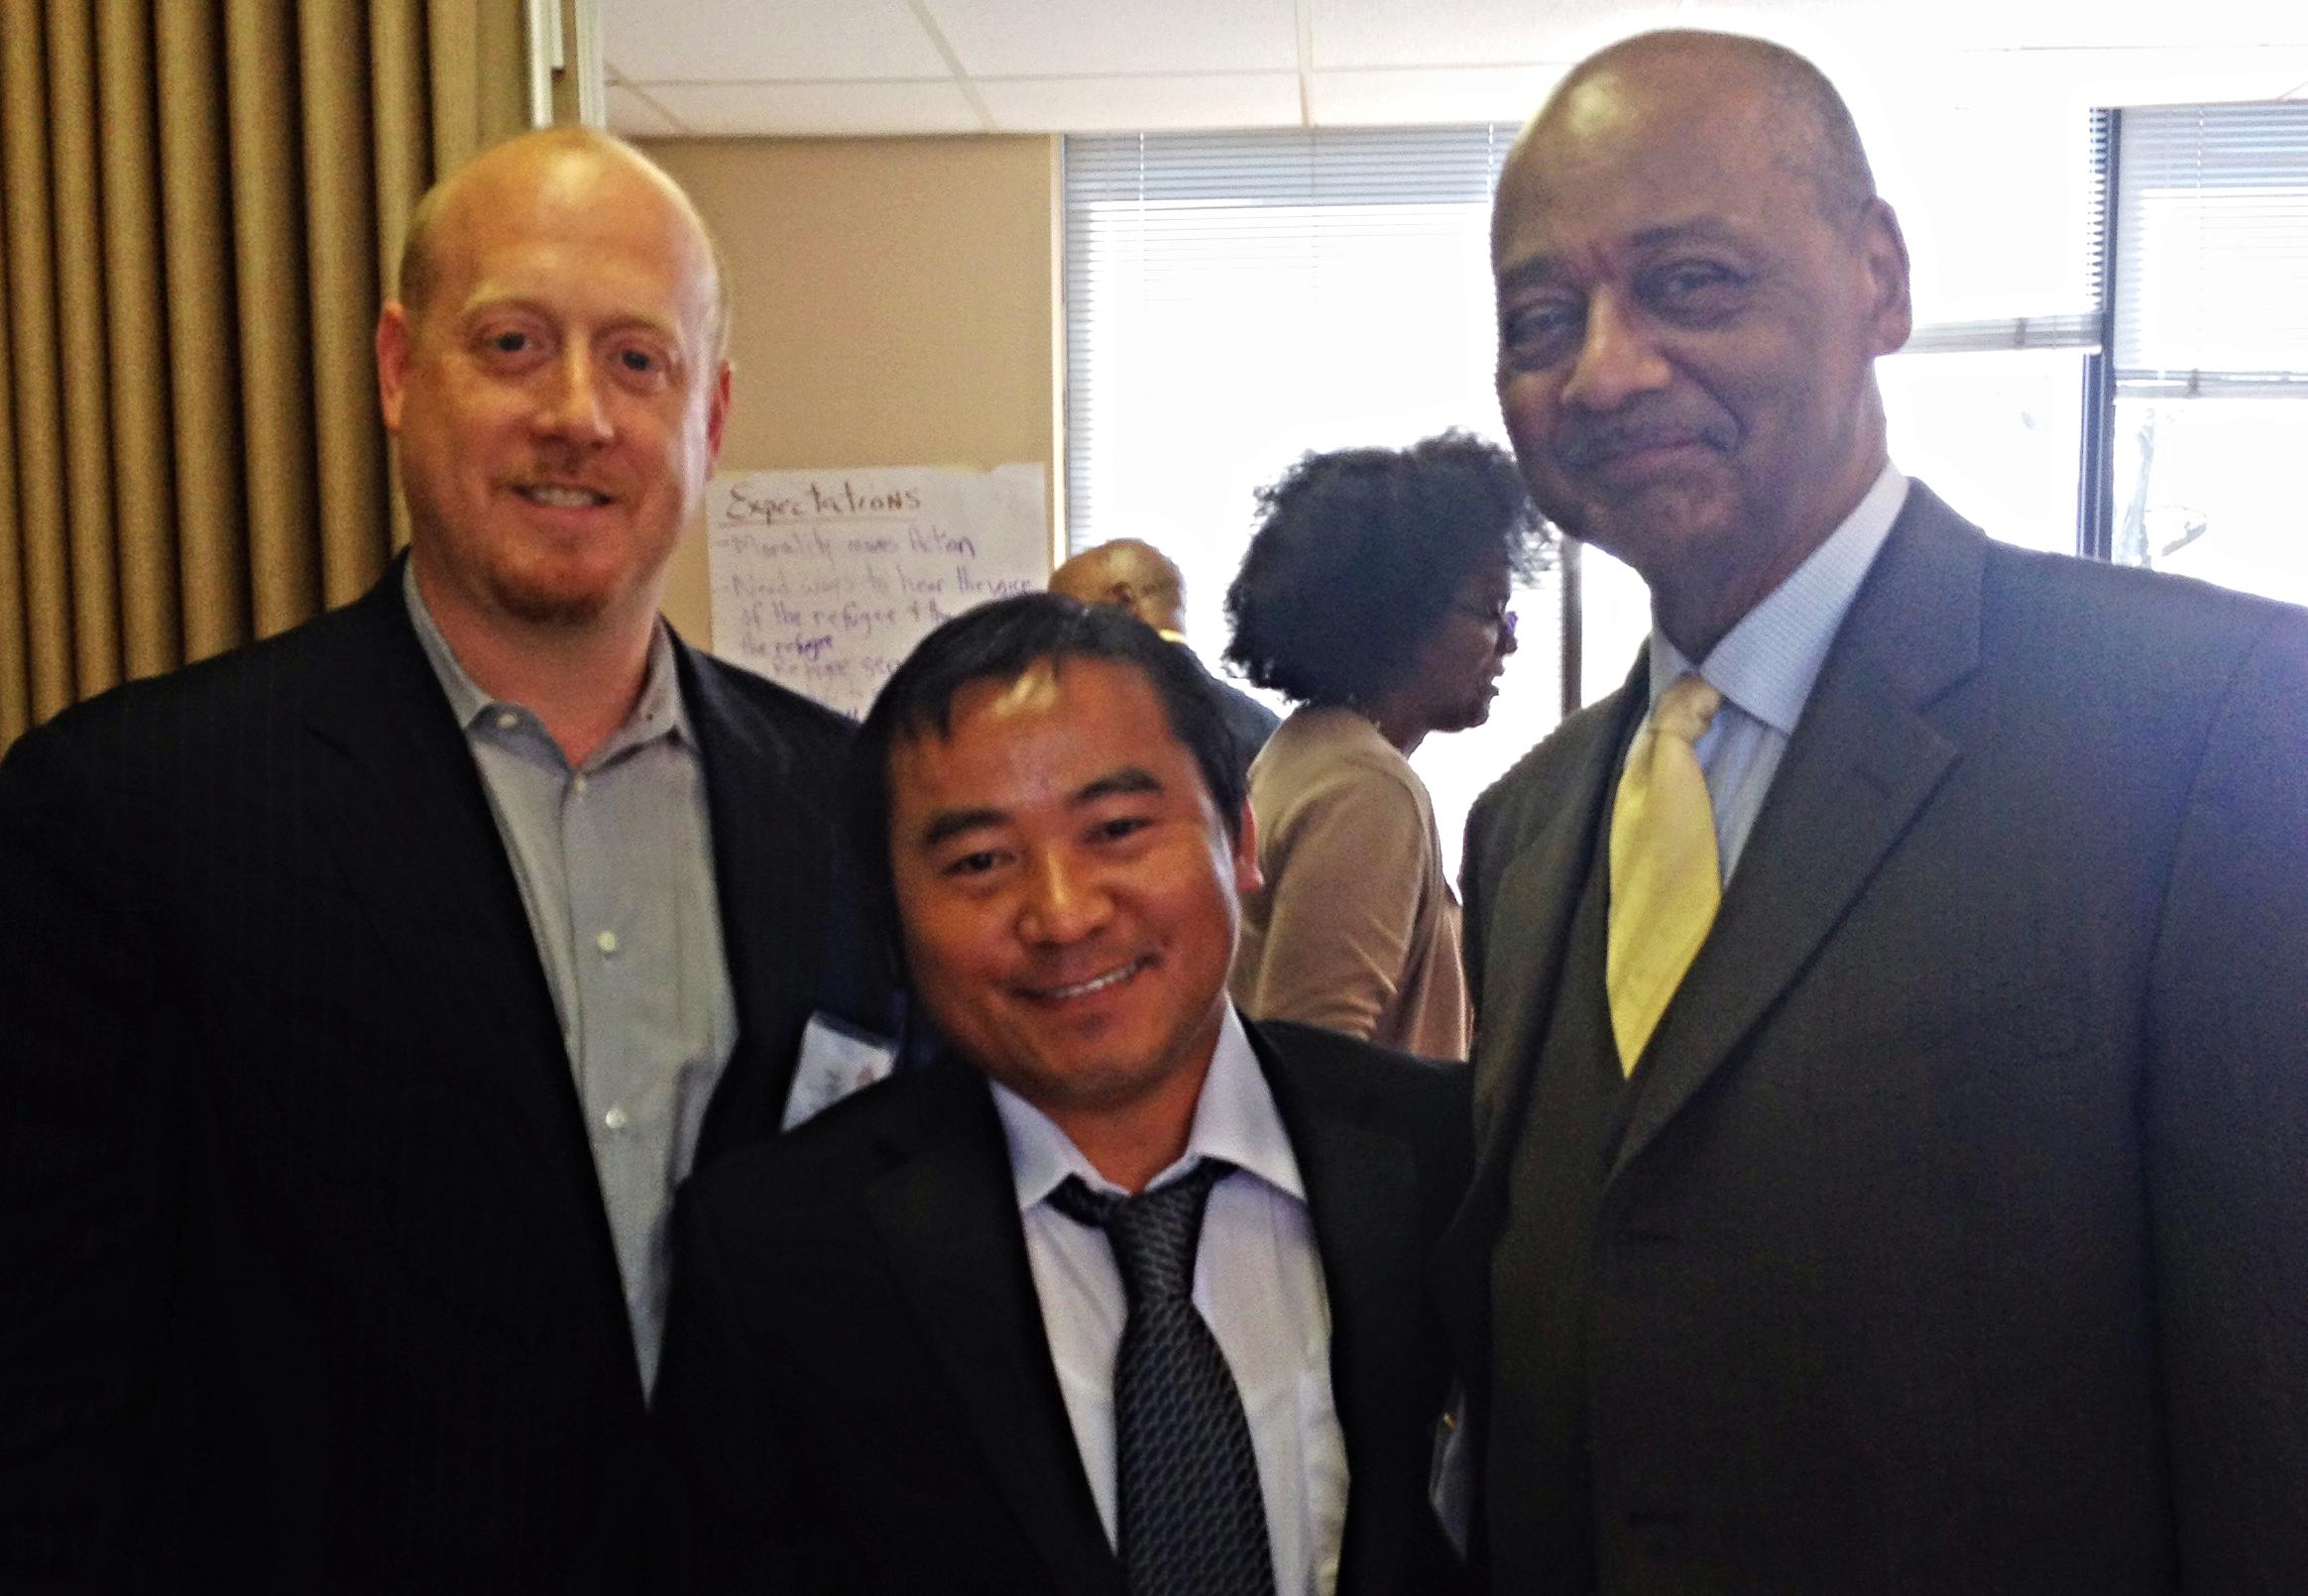 Bhutanese Community Leader Ram Rai (center) with a CNE presenter (right) and Robert L.   Woodson, Sr (left) at the Kansas Community Leadership Enterprise